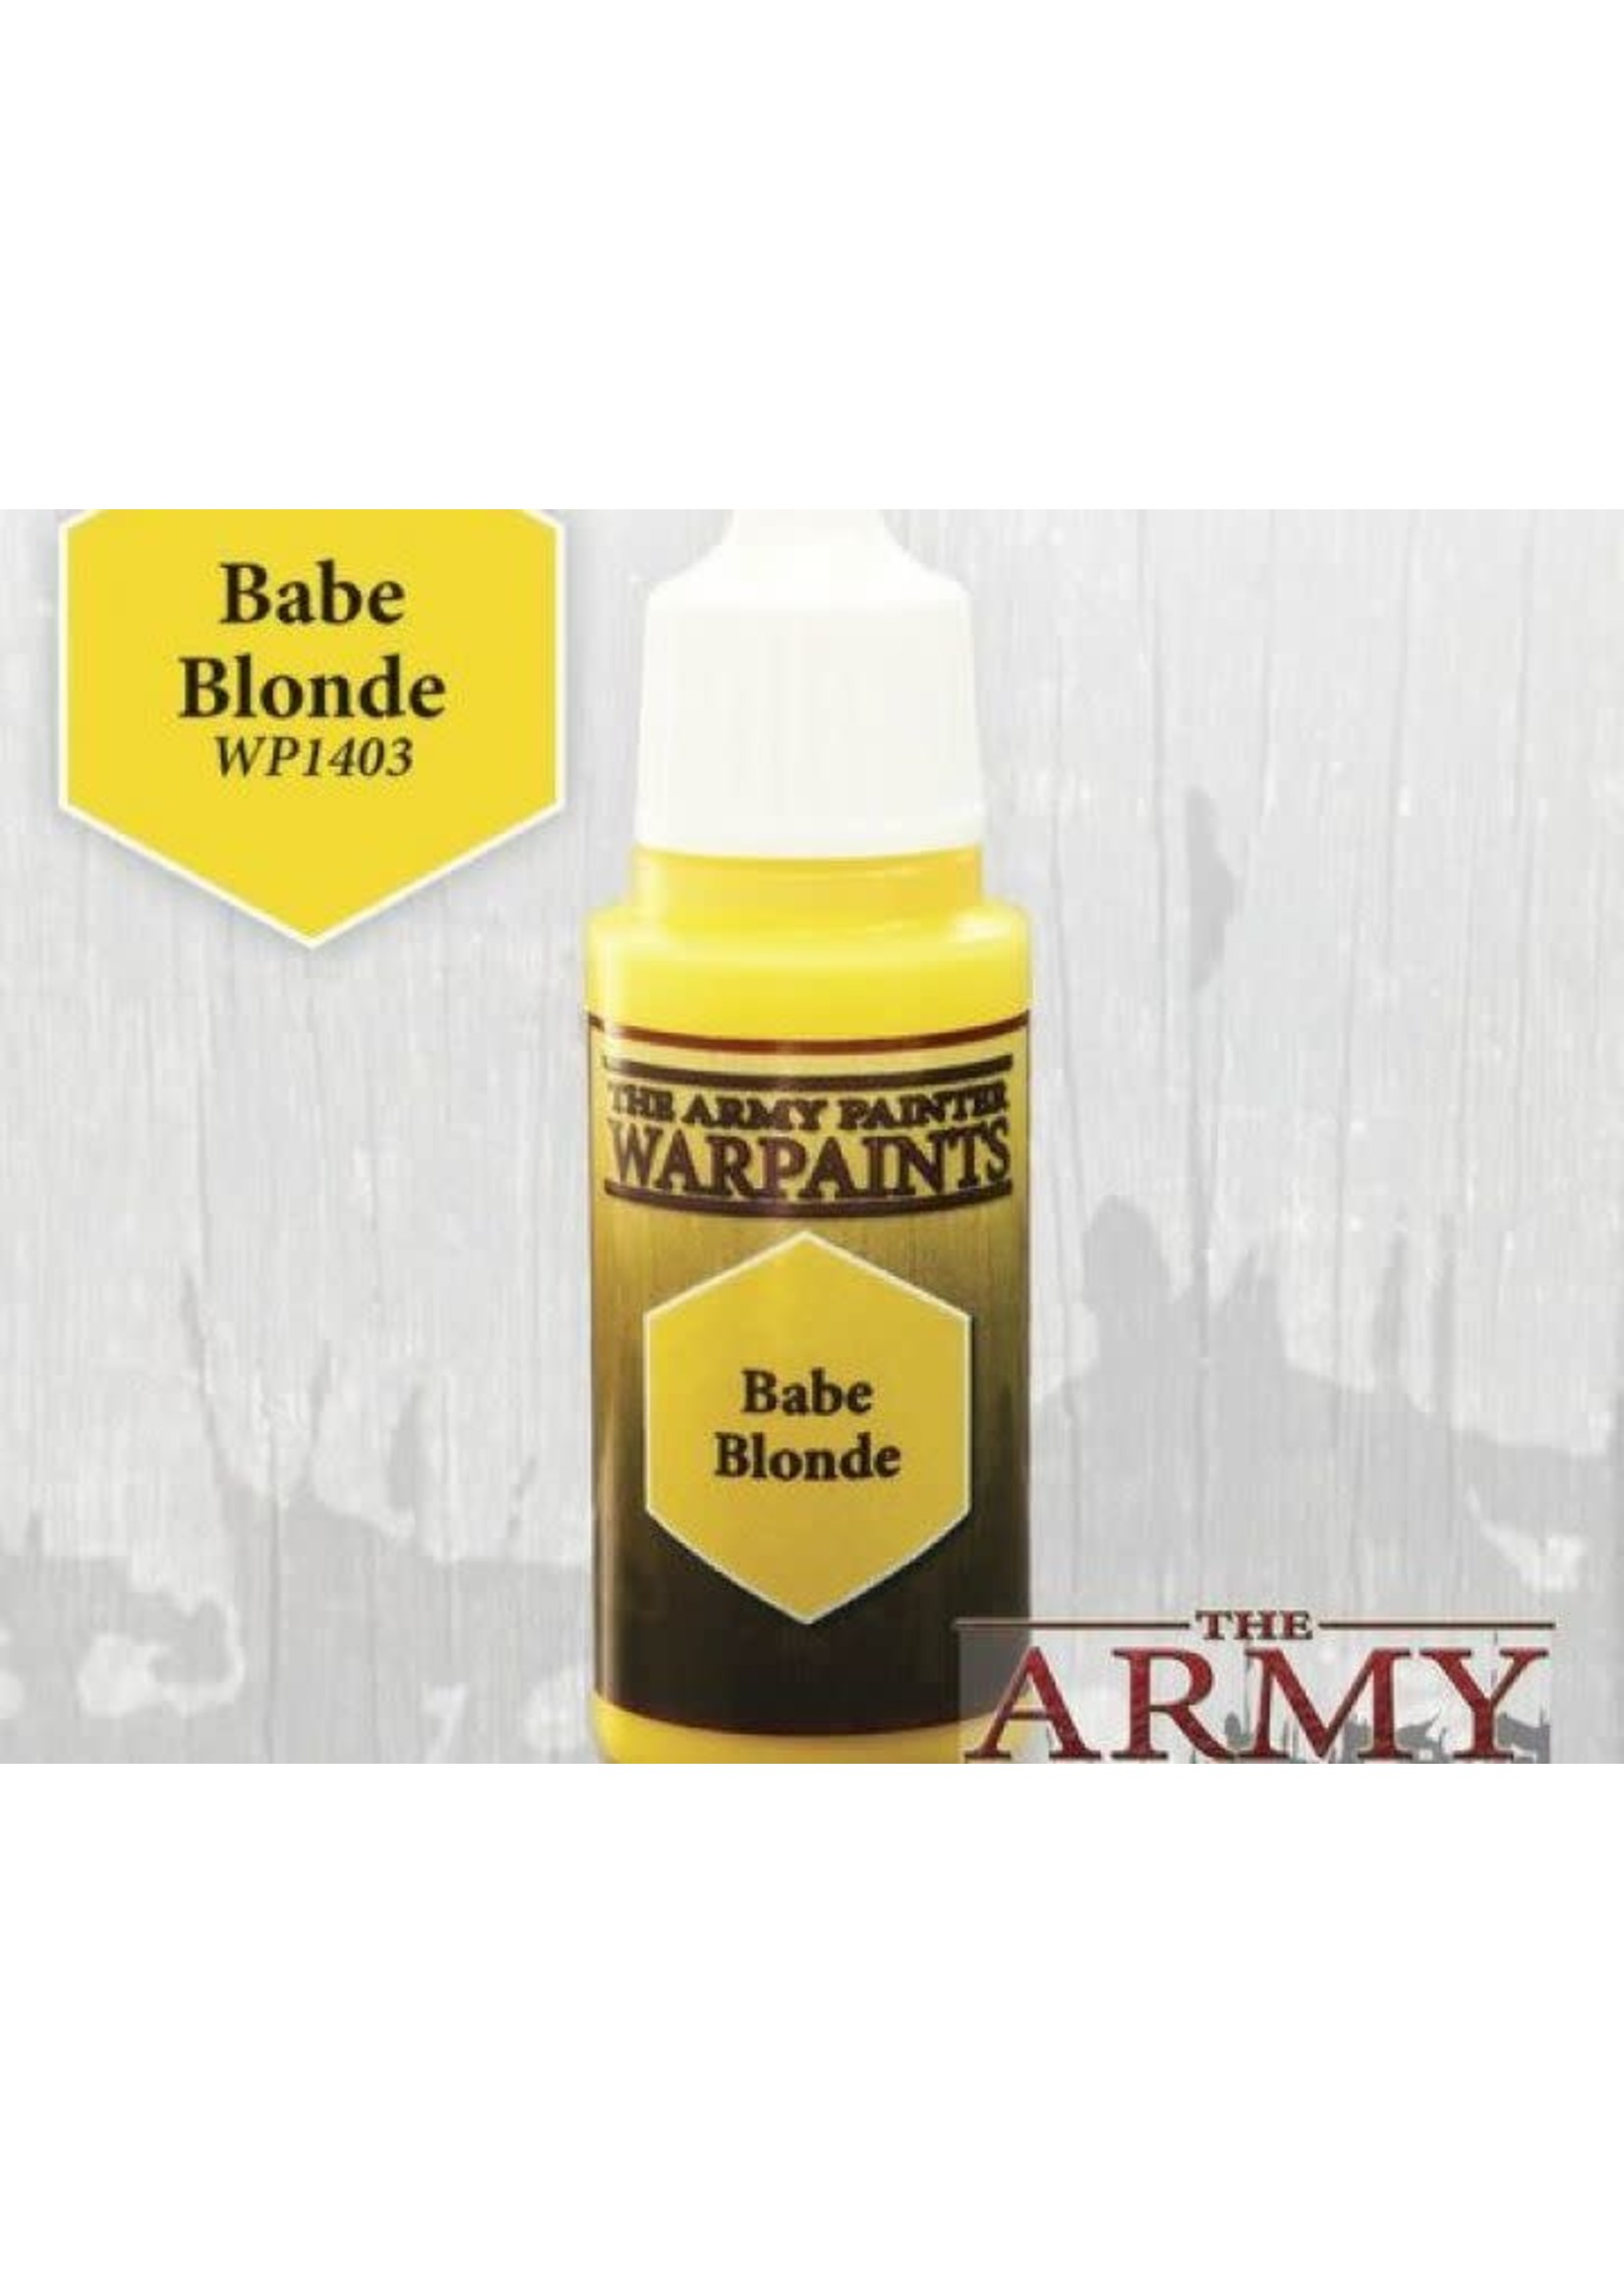 Army Painter Warpaints - Babe Blonde